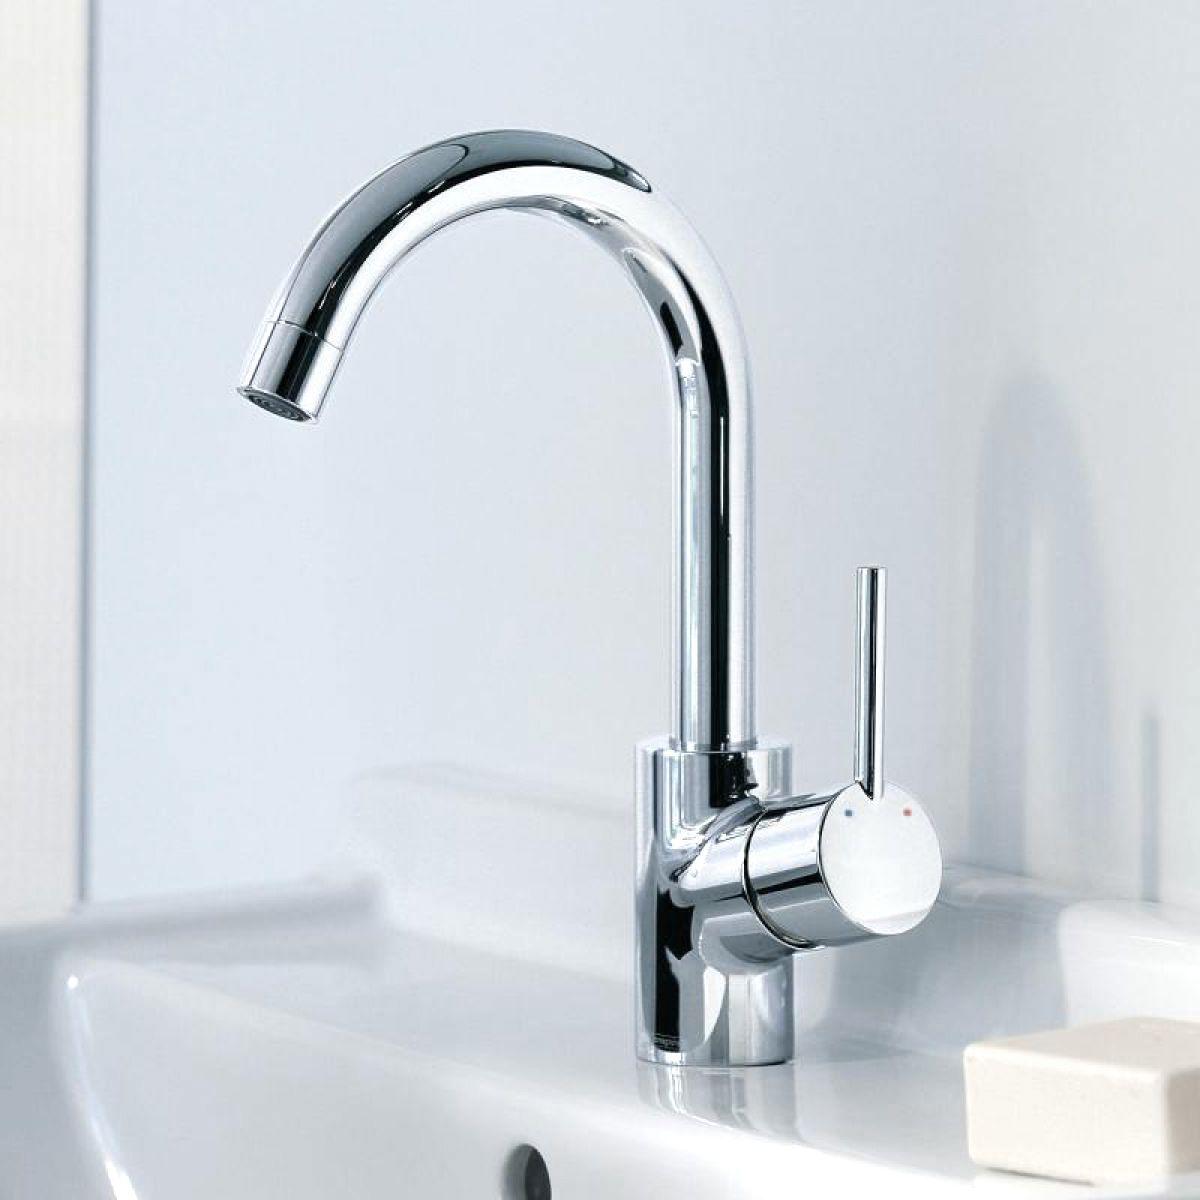 Hansgrohe Talis S Single Lever Basin Mixer Tap : UK Bathrooms